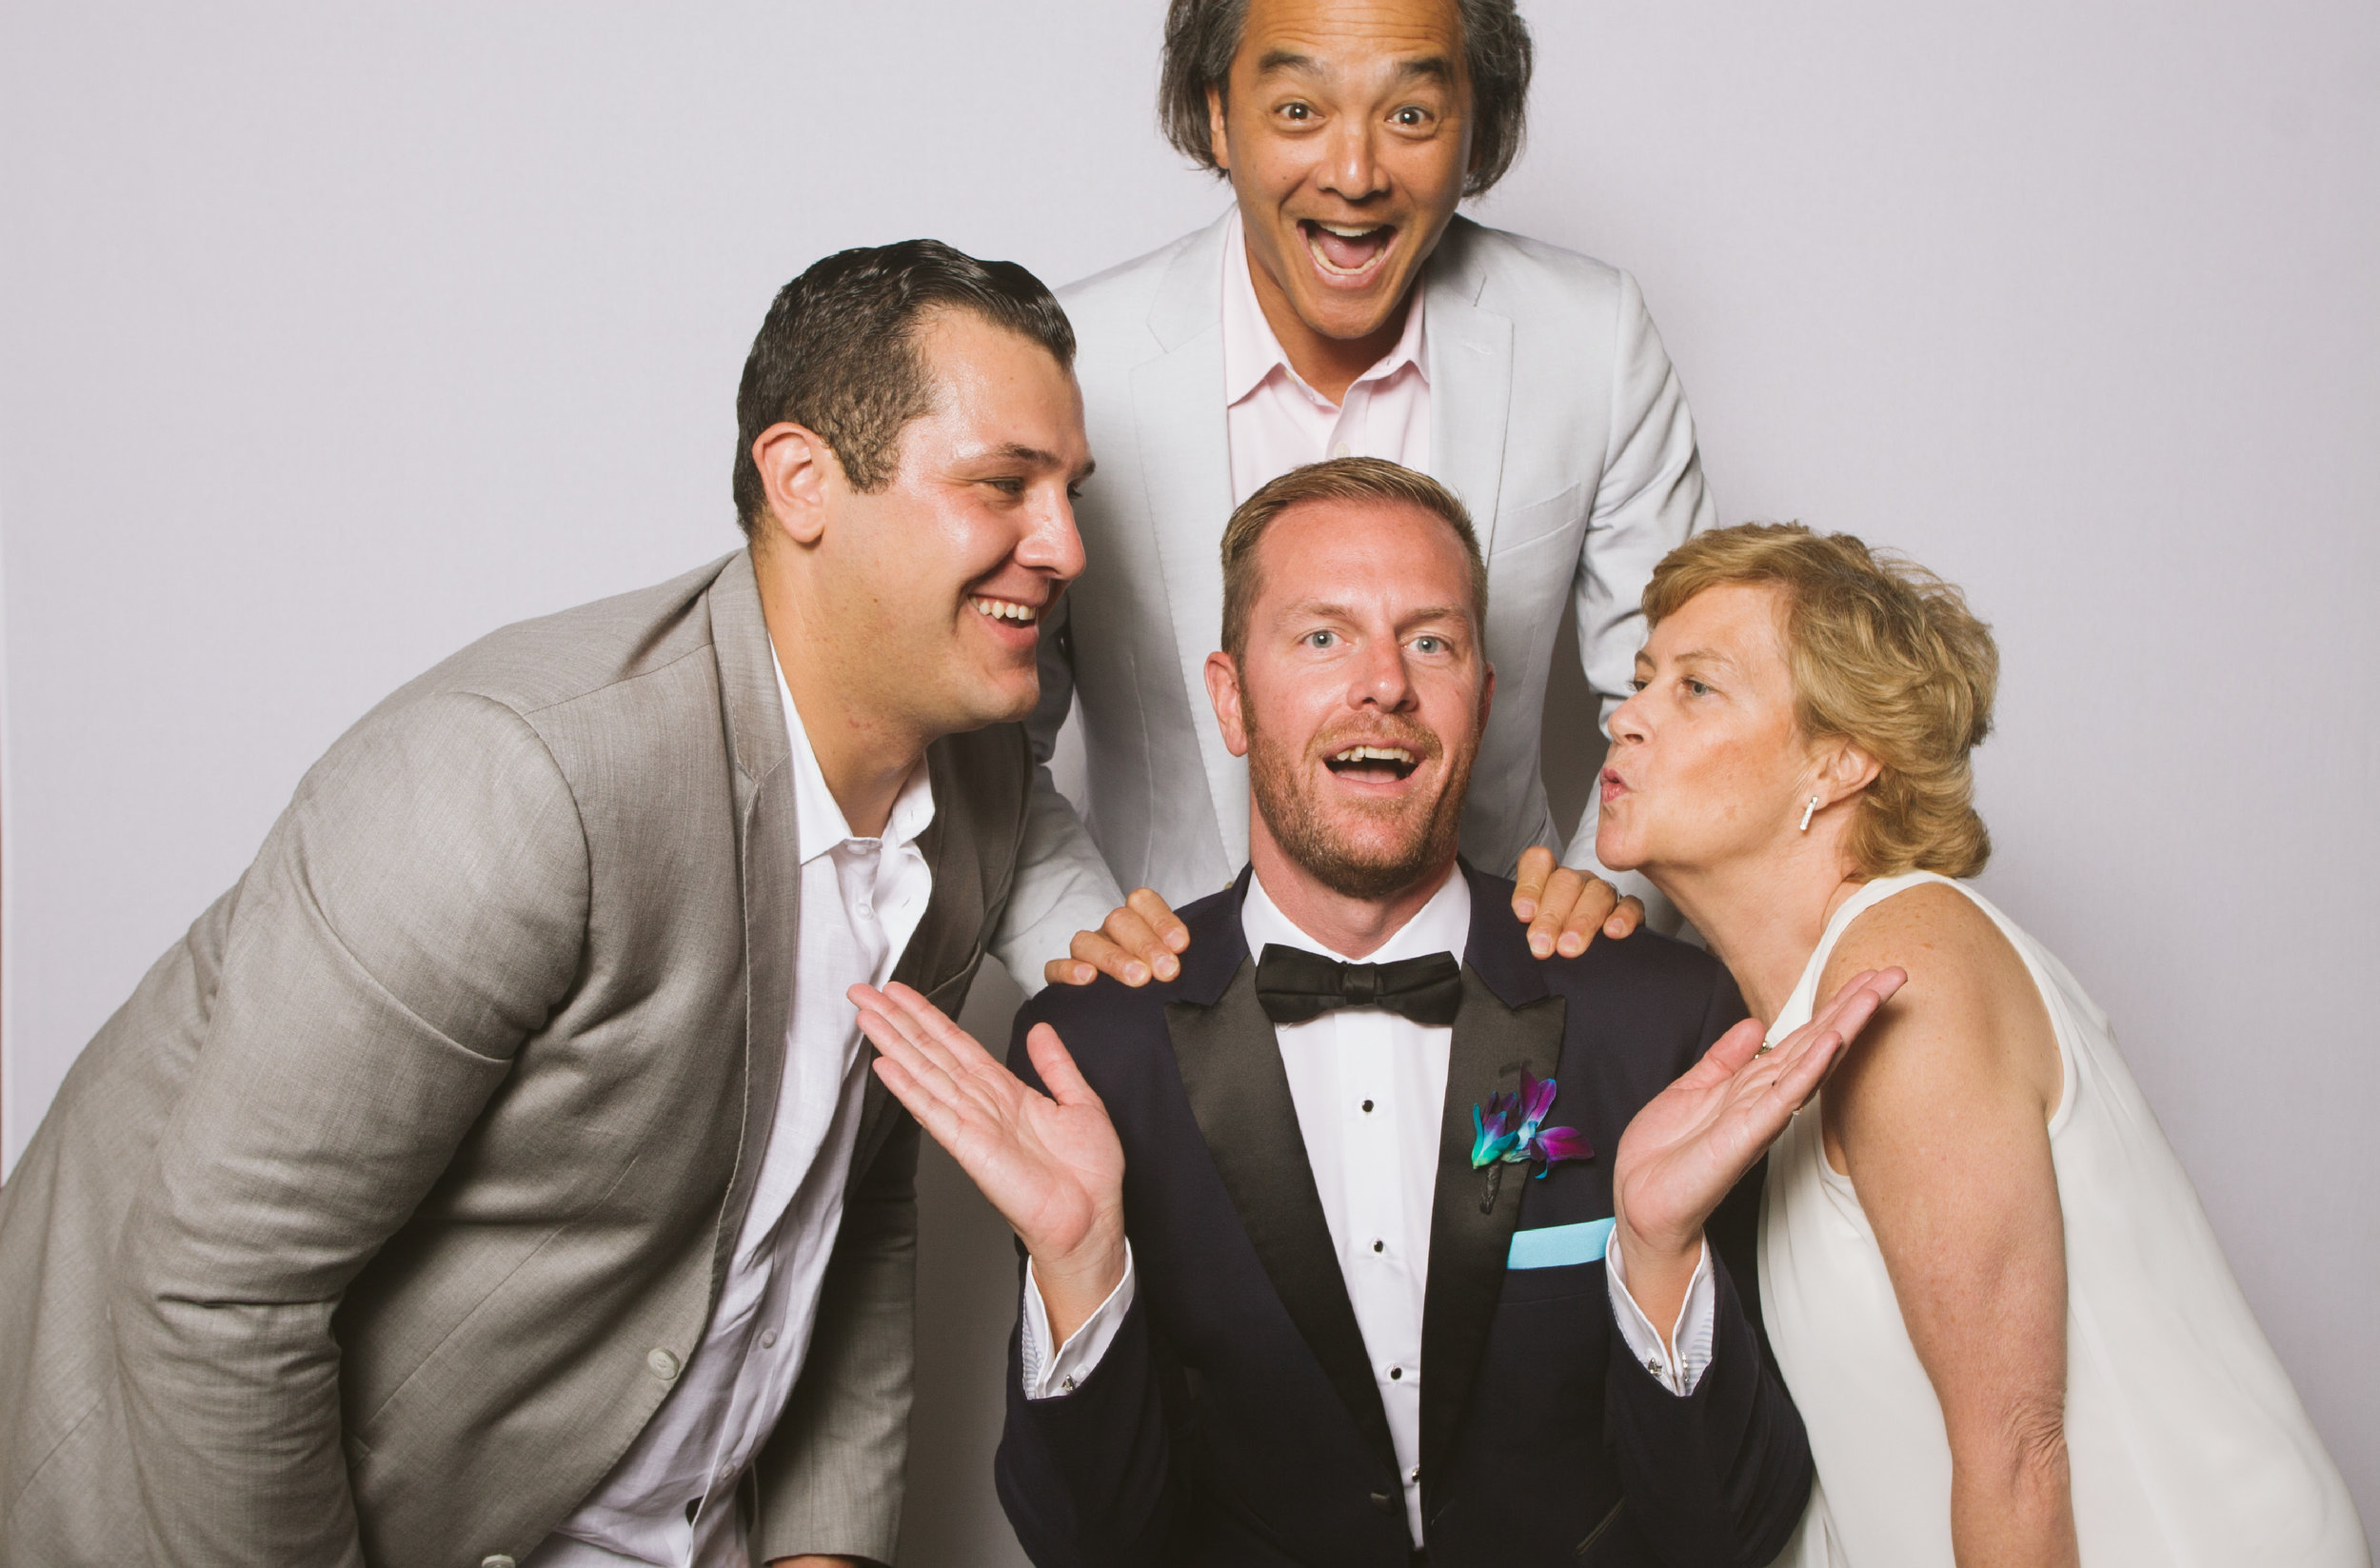 Josh + Craig Wedding Wackybooth Photobooth at the W South Beach in Maimi5.jpg